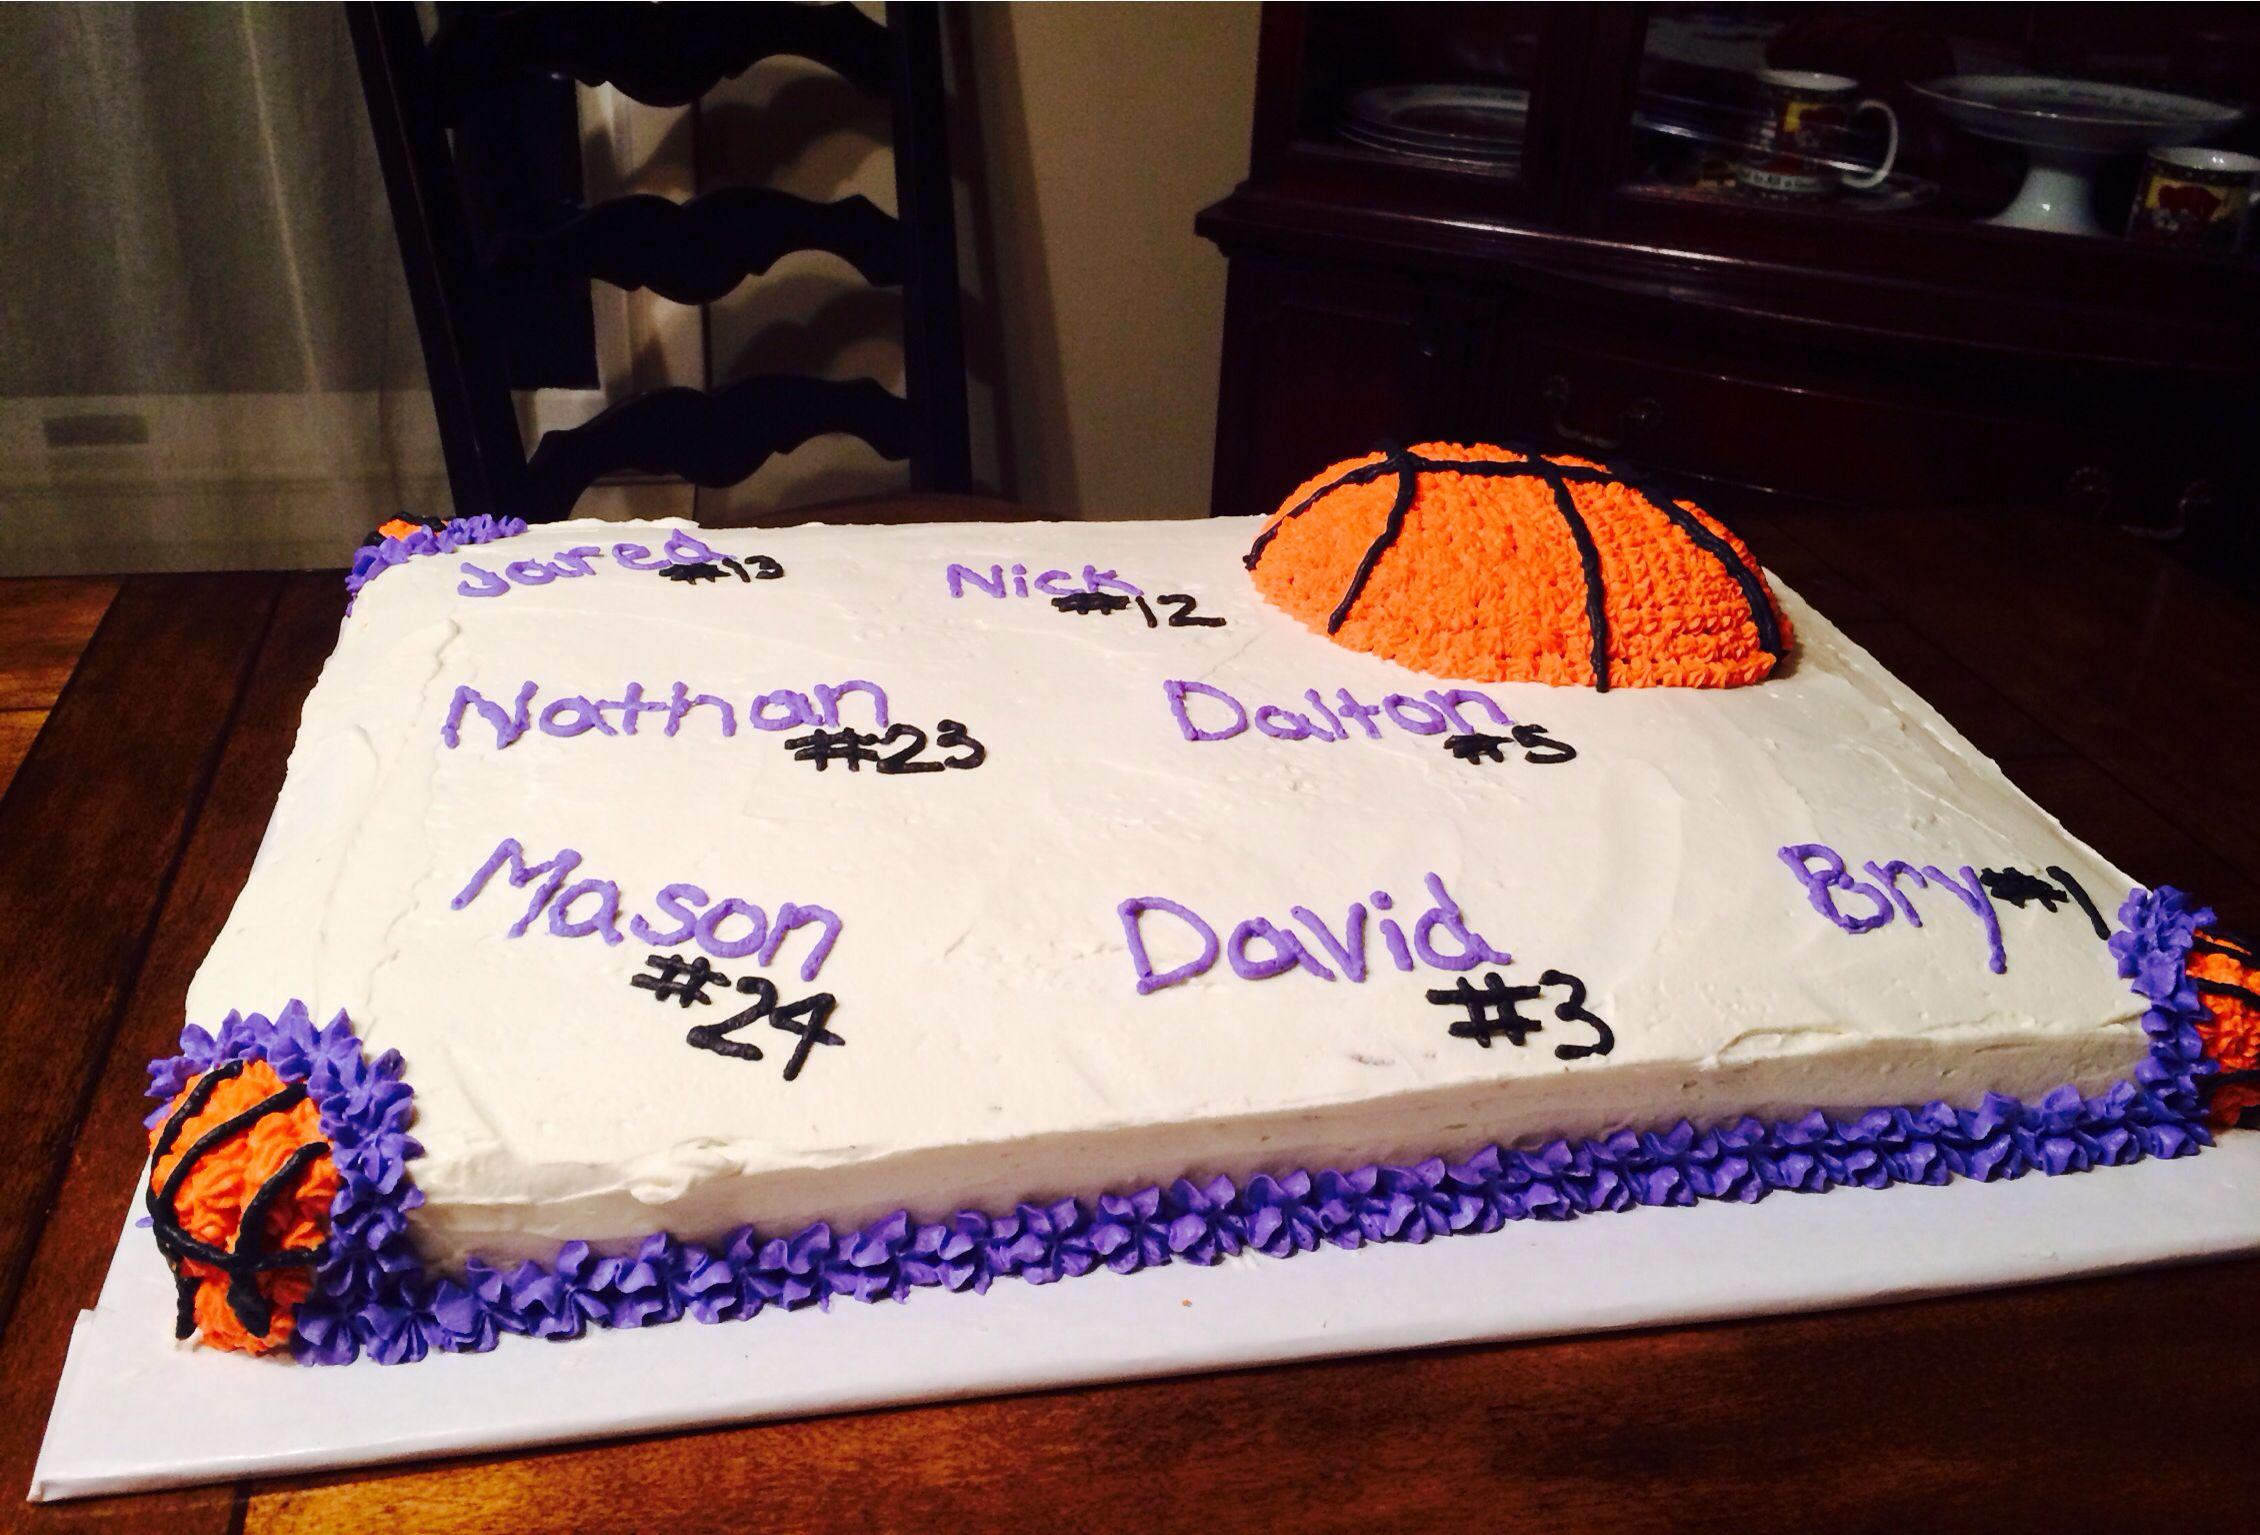 Cupcake Decorating Ideas For Seniors : Pin Basketball Senior Night Locker Decorations Cake on ...